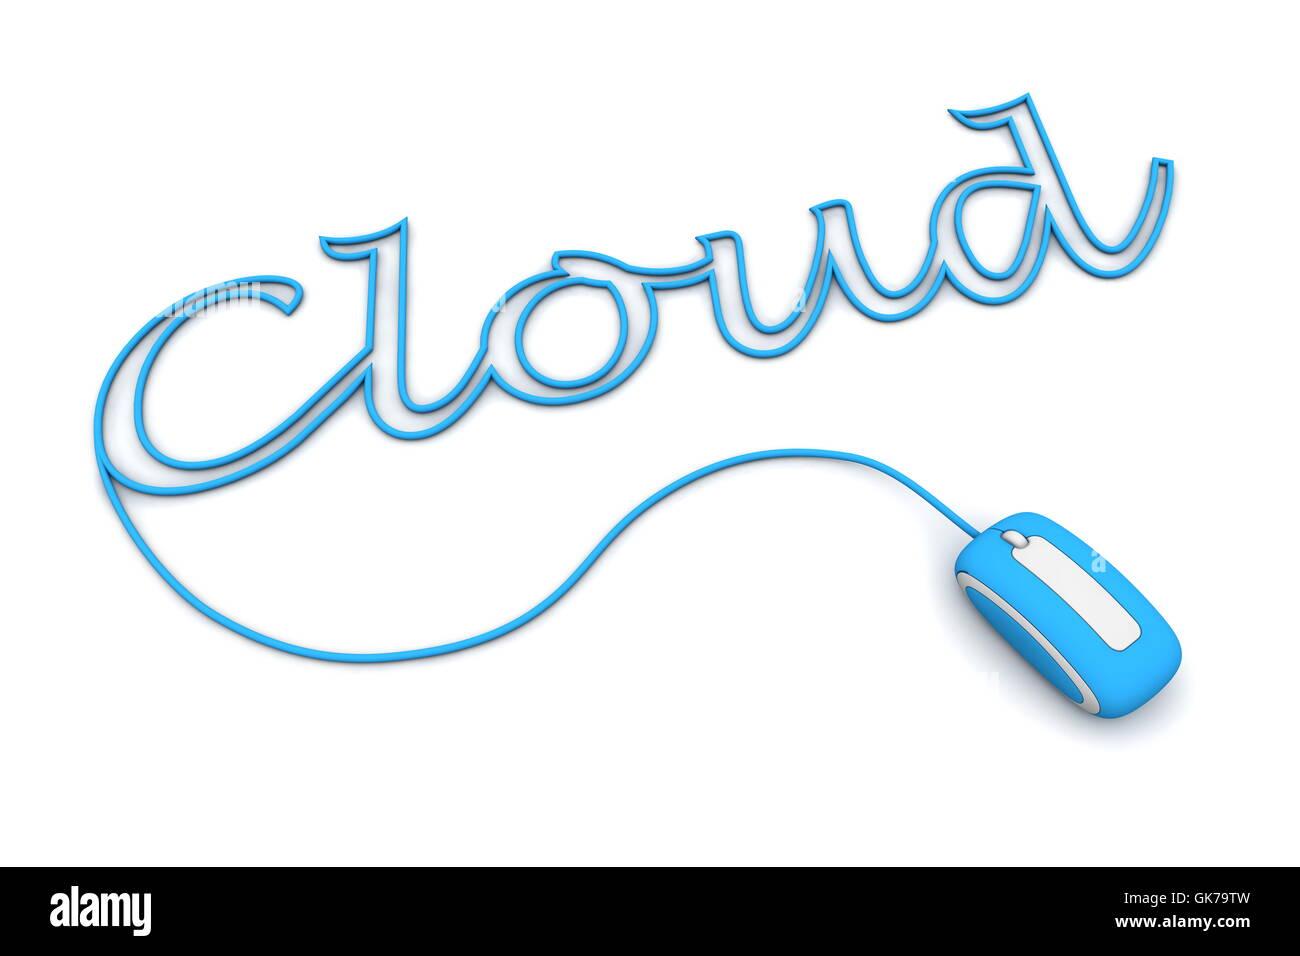 blue cloud word Stock Photo